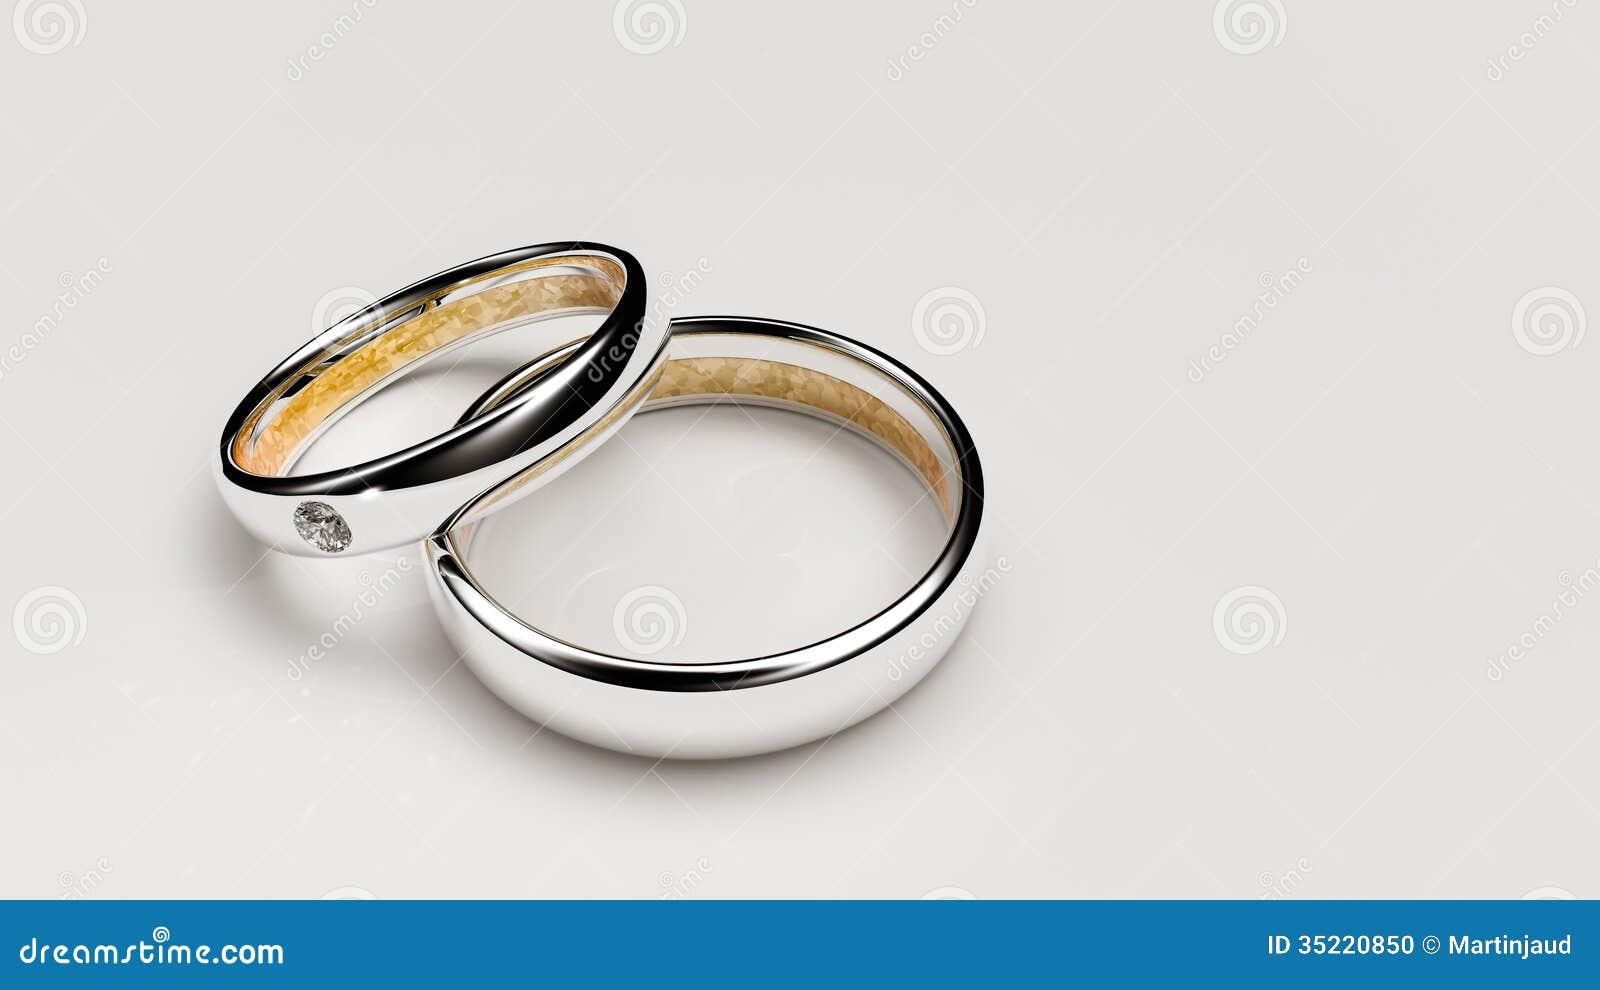 Pair Of Lovers Wedding Rings Stock Photo Image 35220850